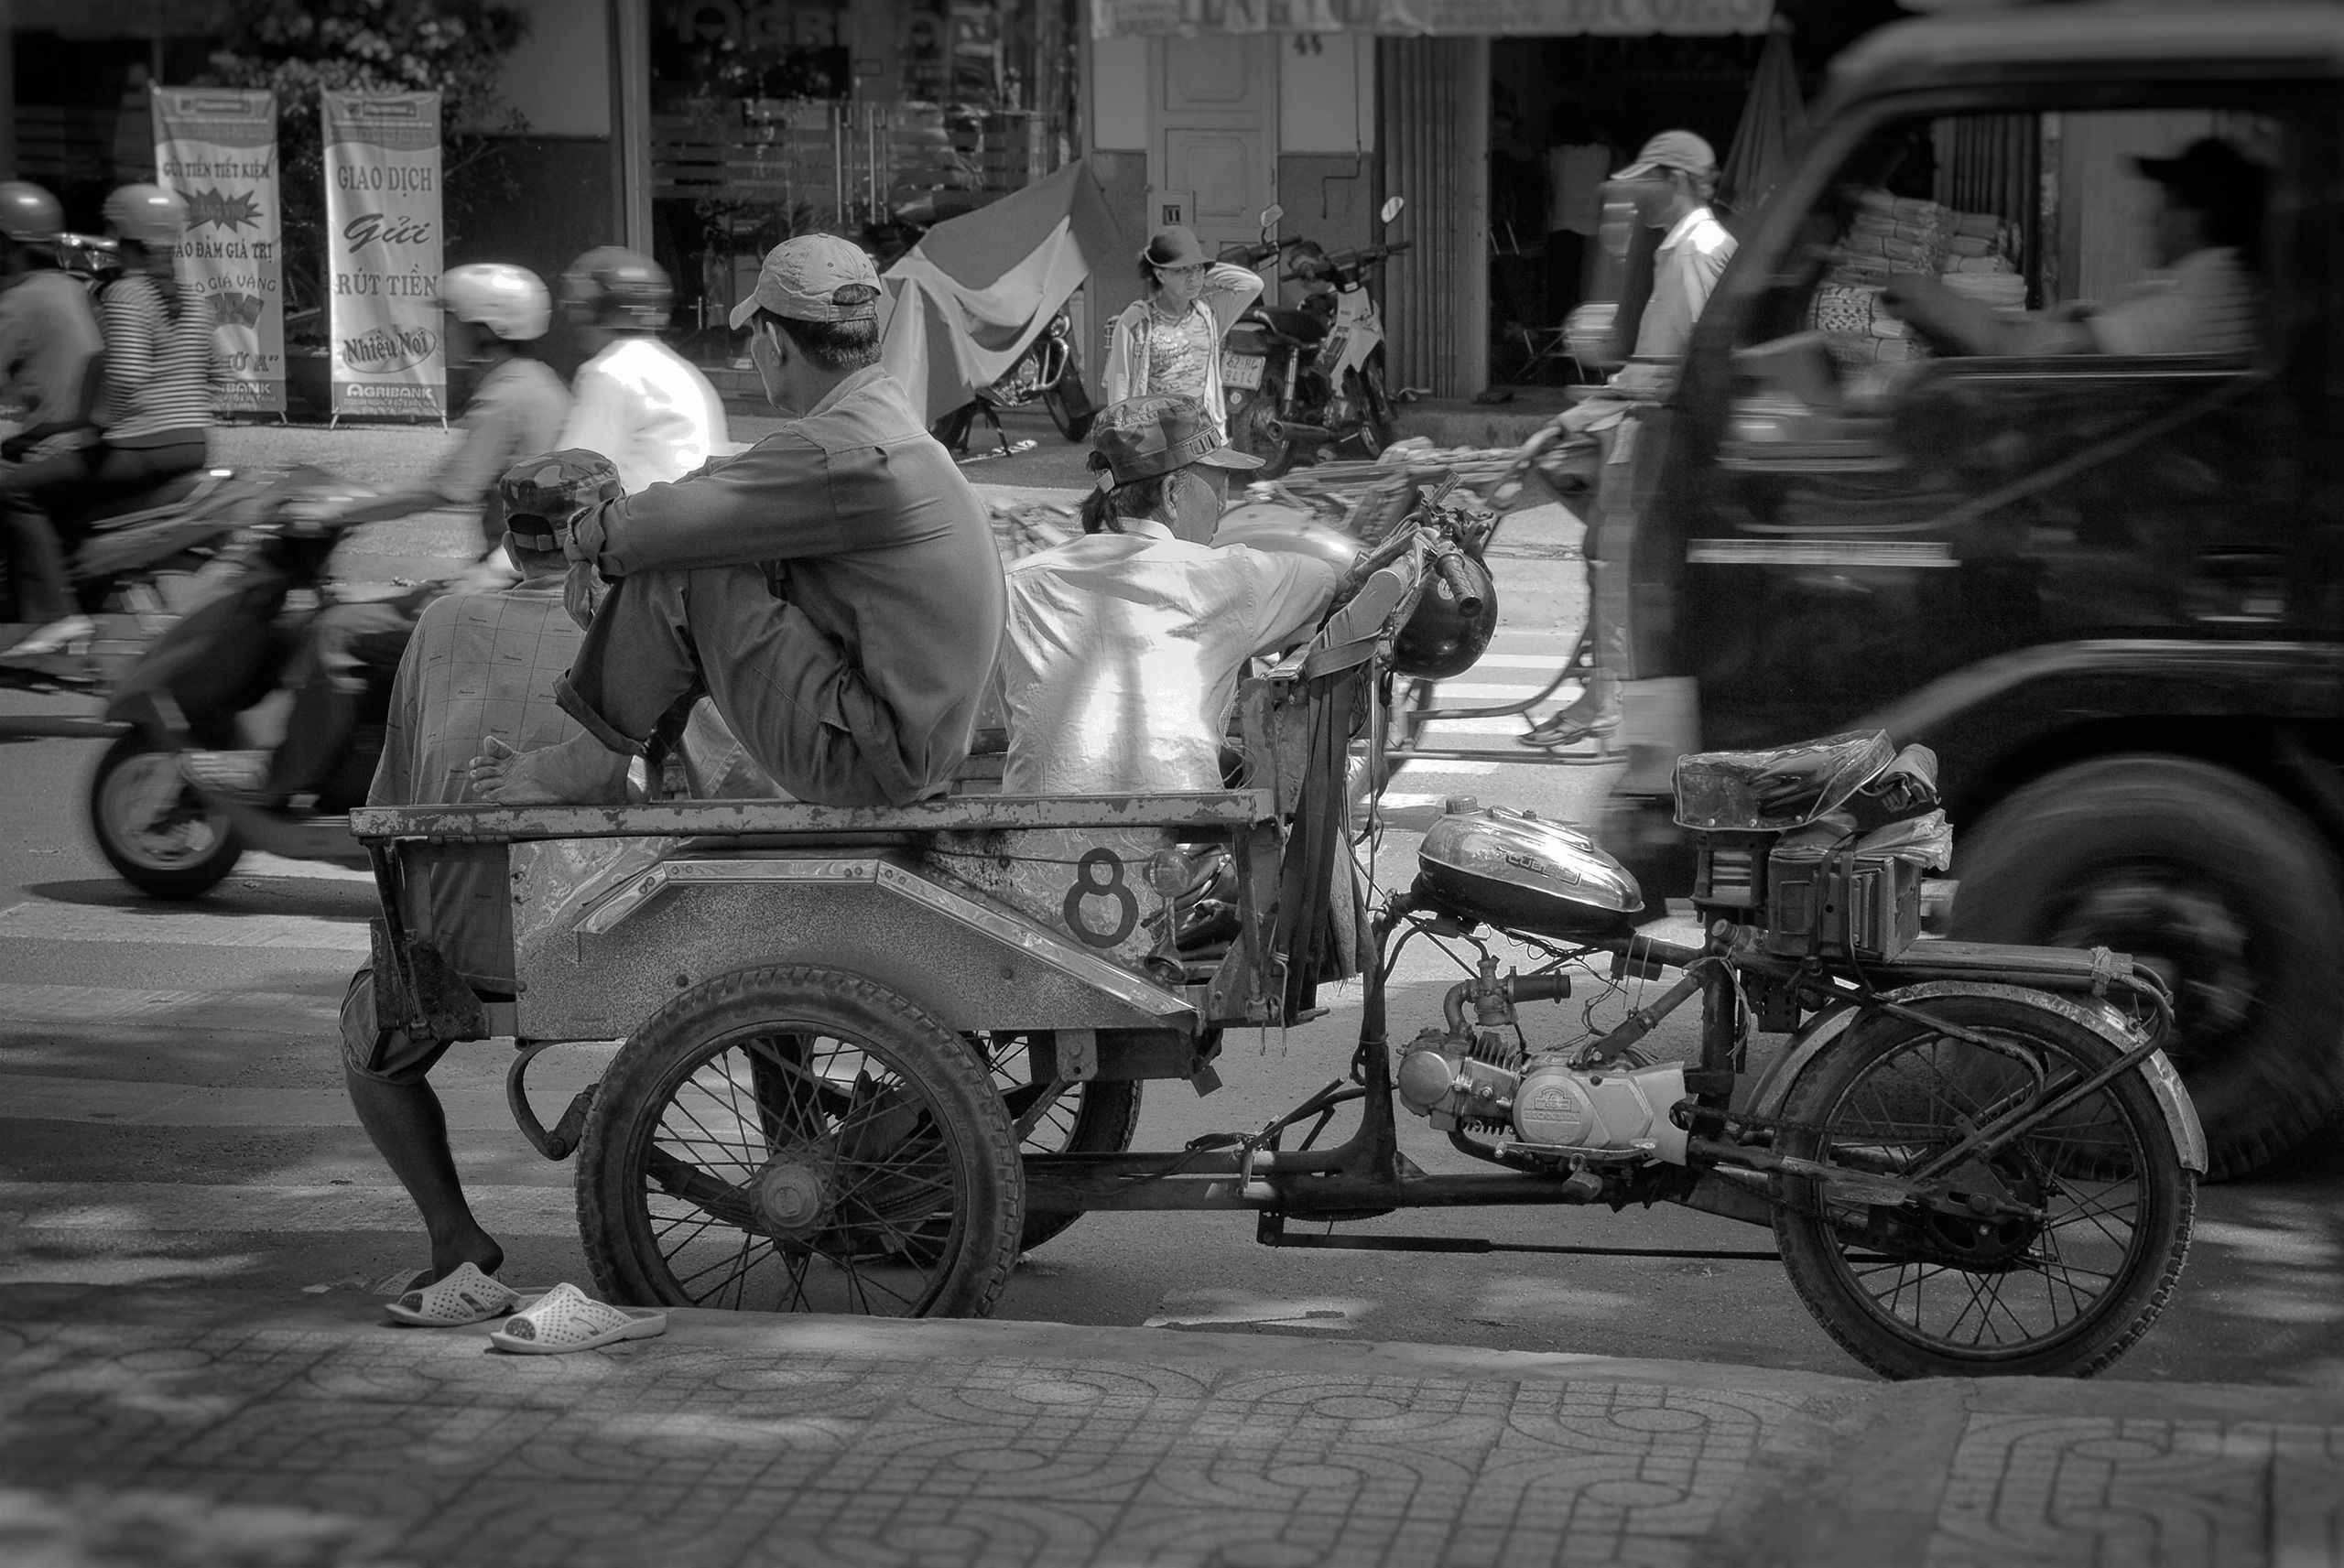 buddies Saigon Vietnam - christofkessemeier | ello